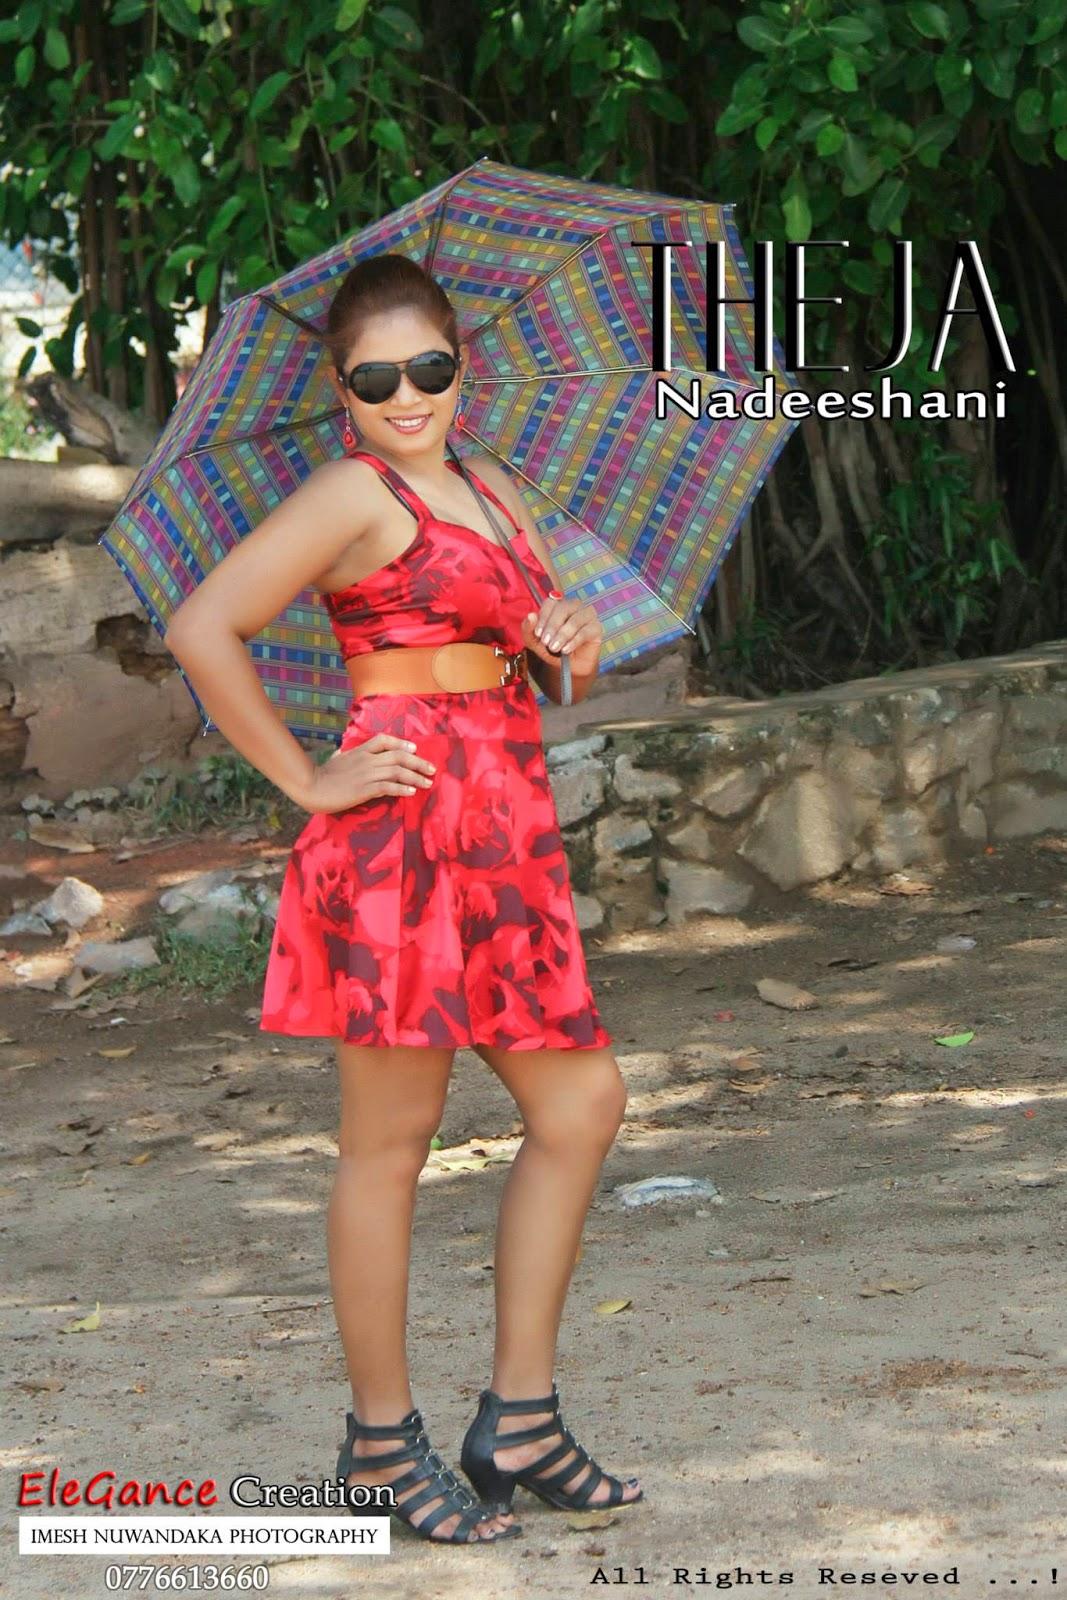 THEJA NADEESHANI short dress